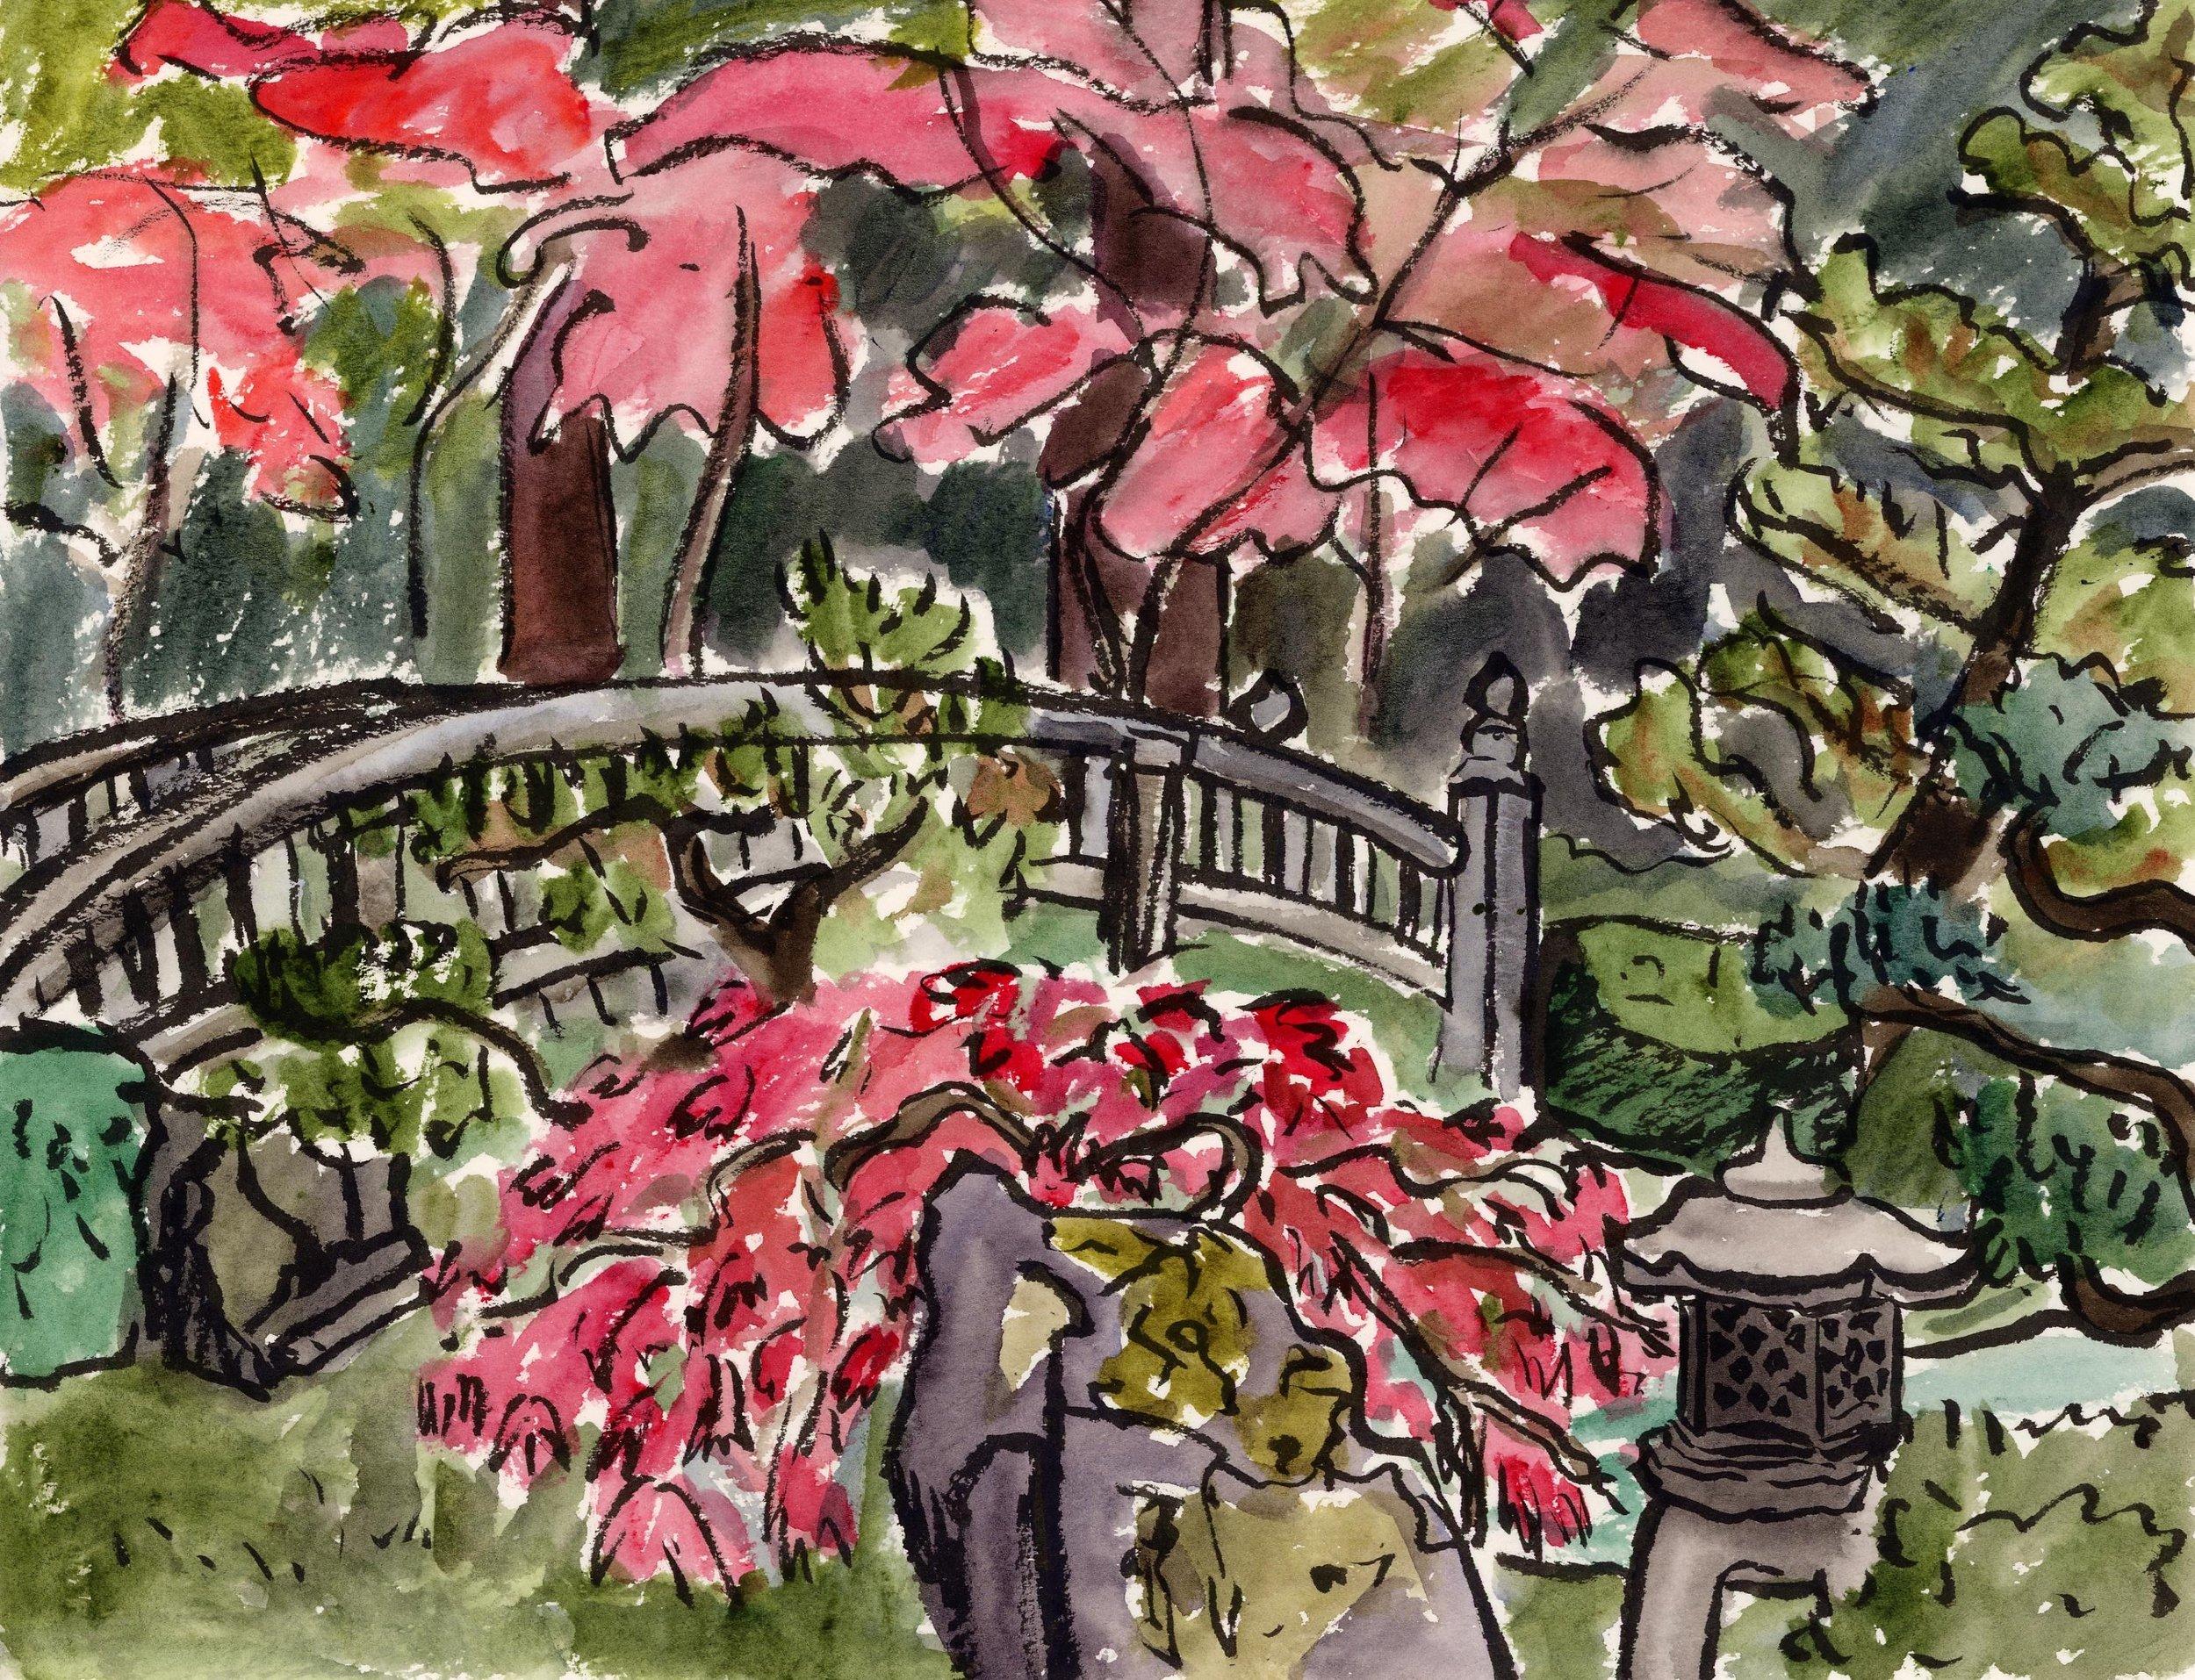 Beautiful fall foliage at the Japanese Gardens.